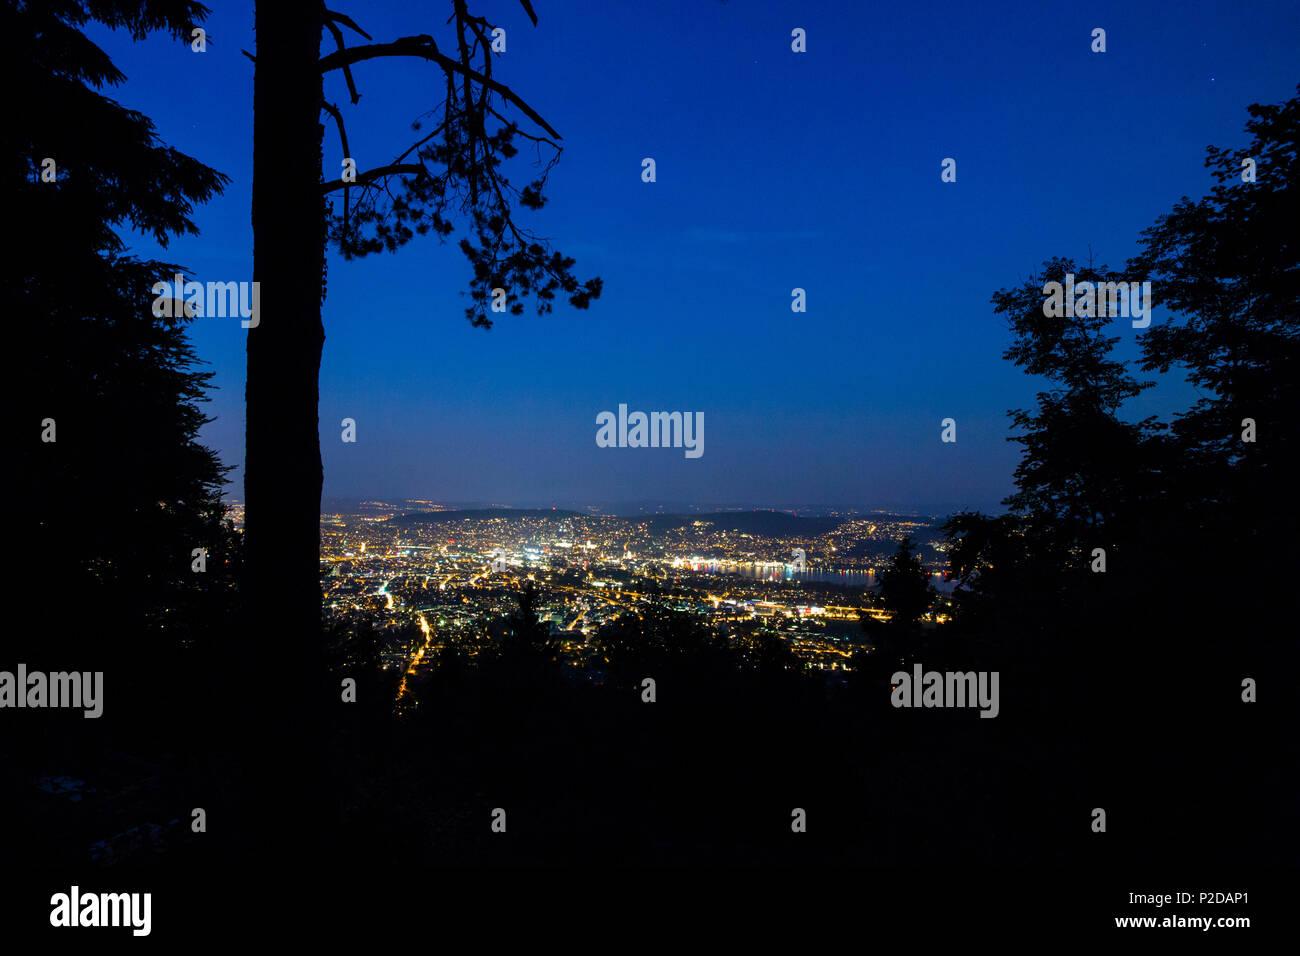 Zurich at night, View from the Uetliberg, Zurich, Switzerland - Stock Image